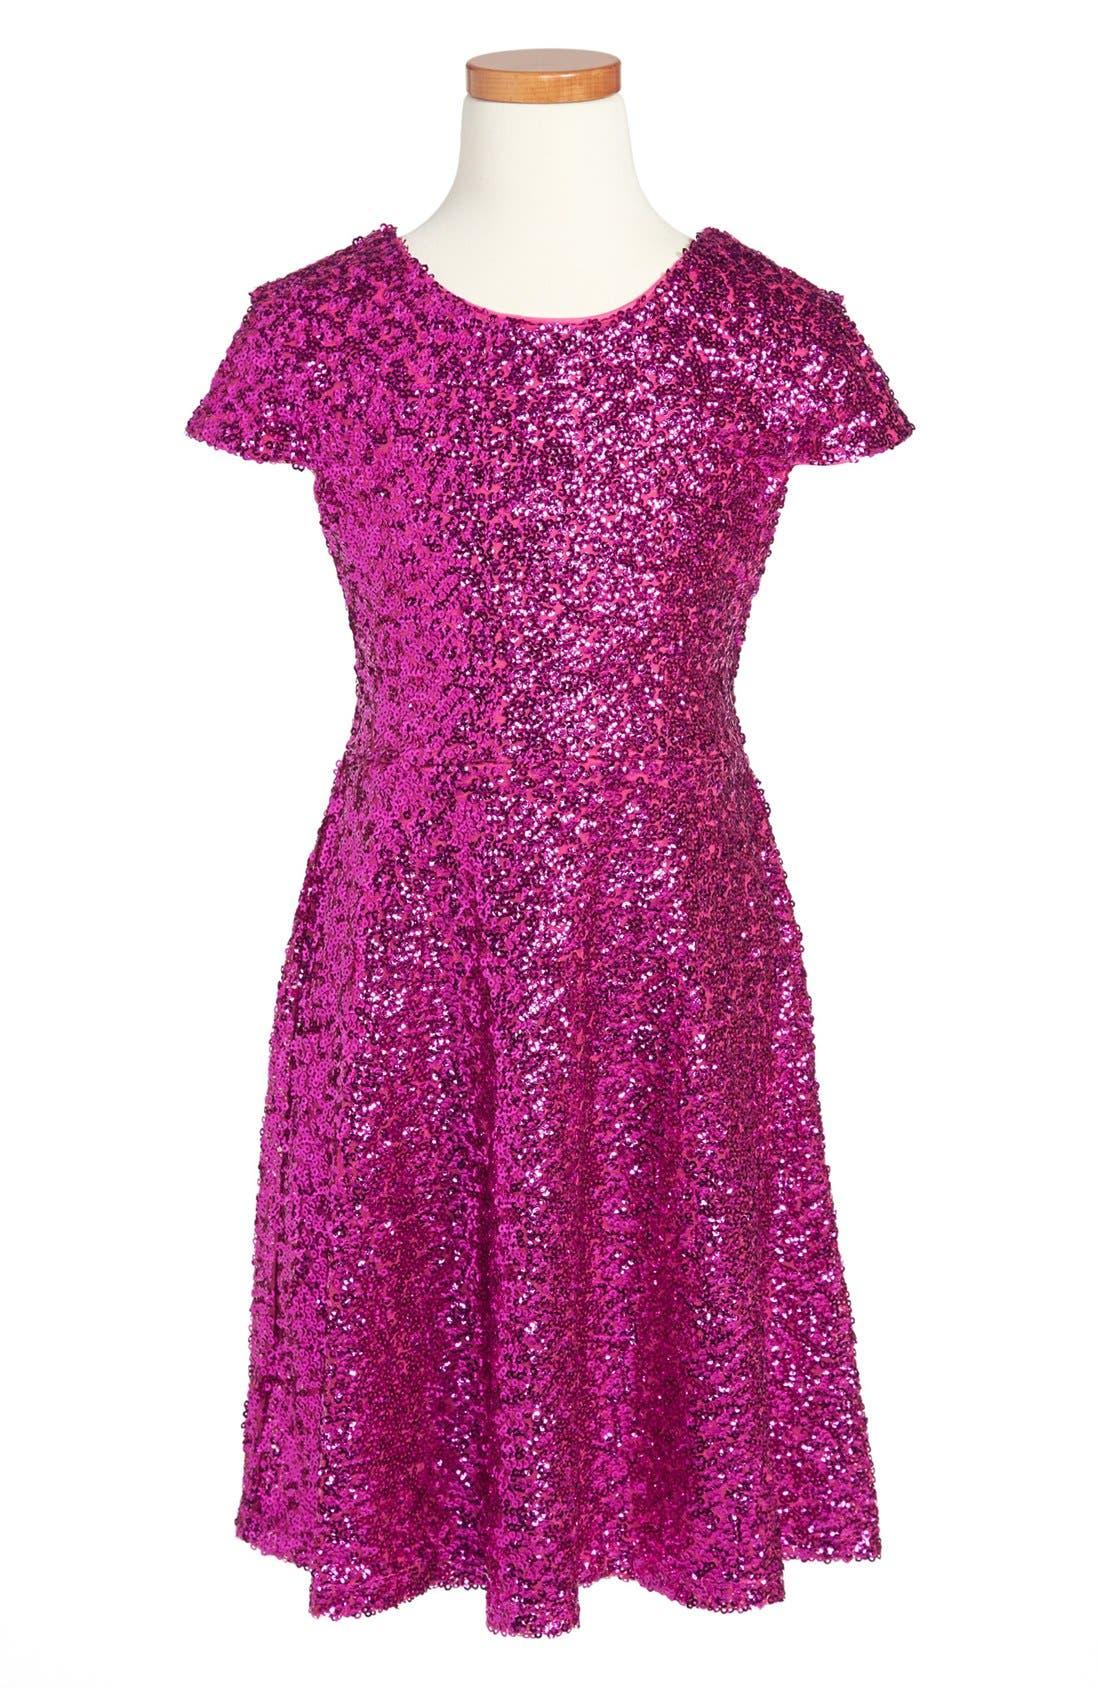 Main Image - Roxette Cap Sleeve Sequin Dress (Big Girls)